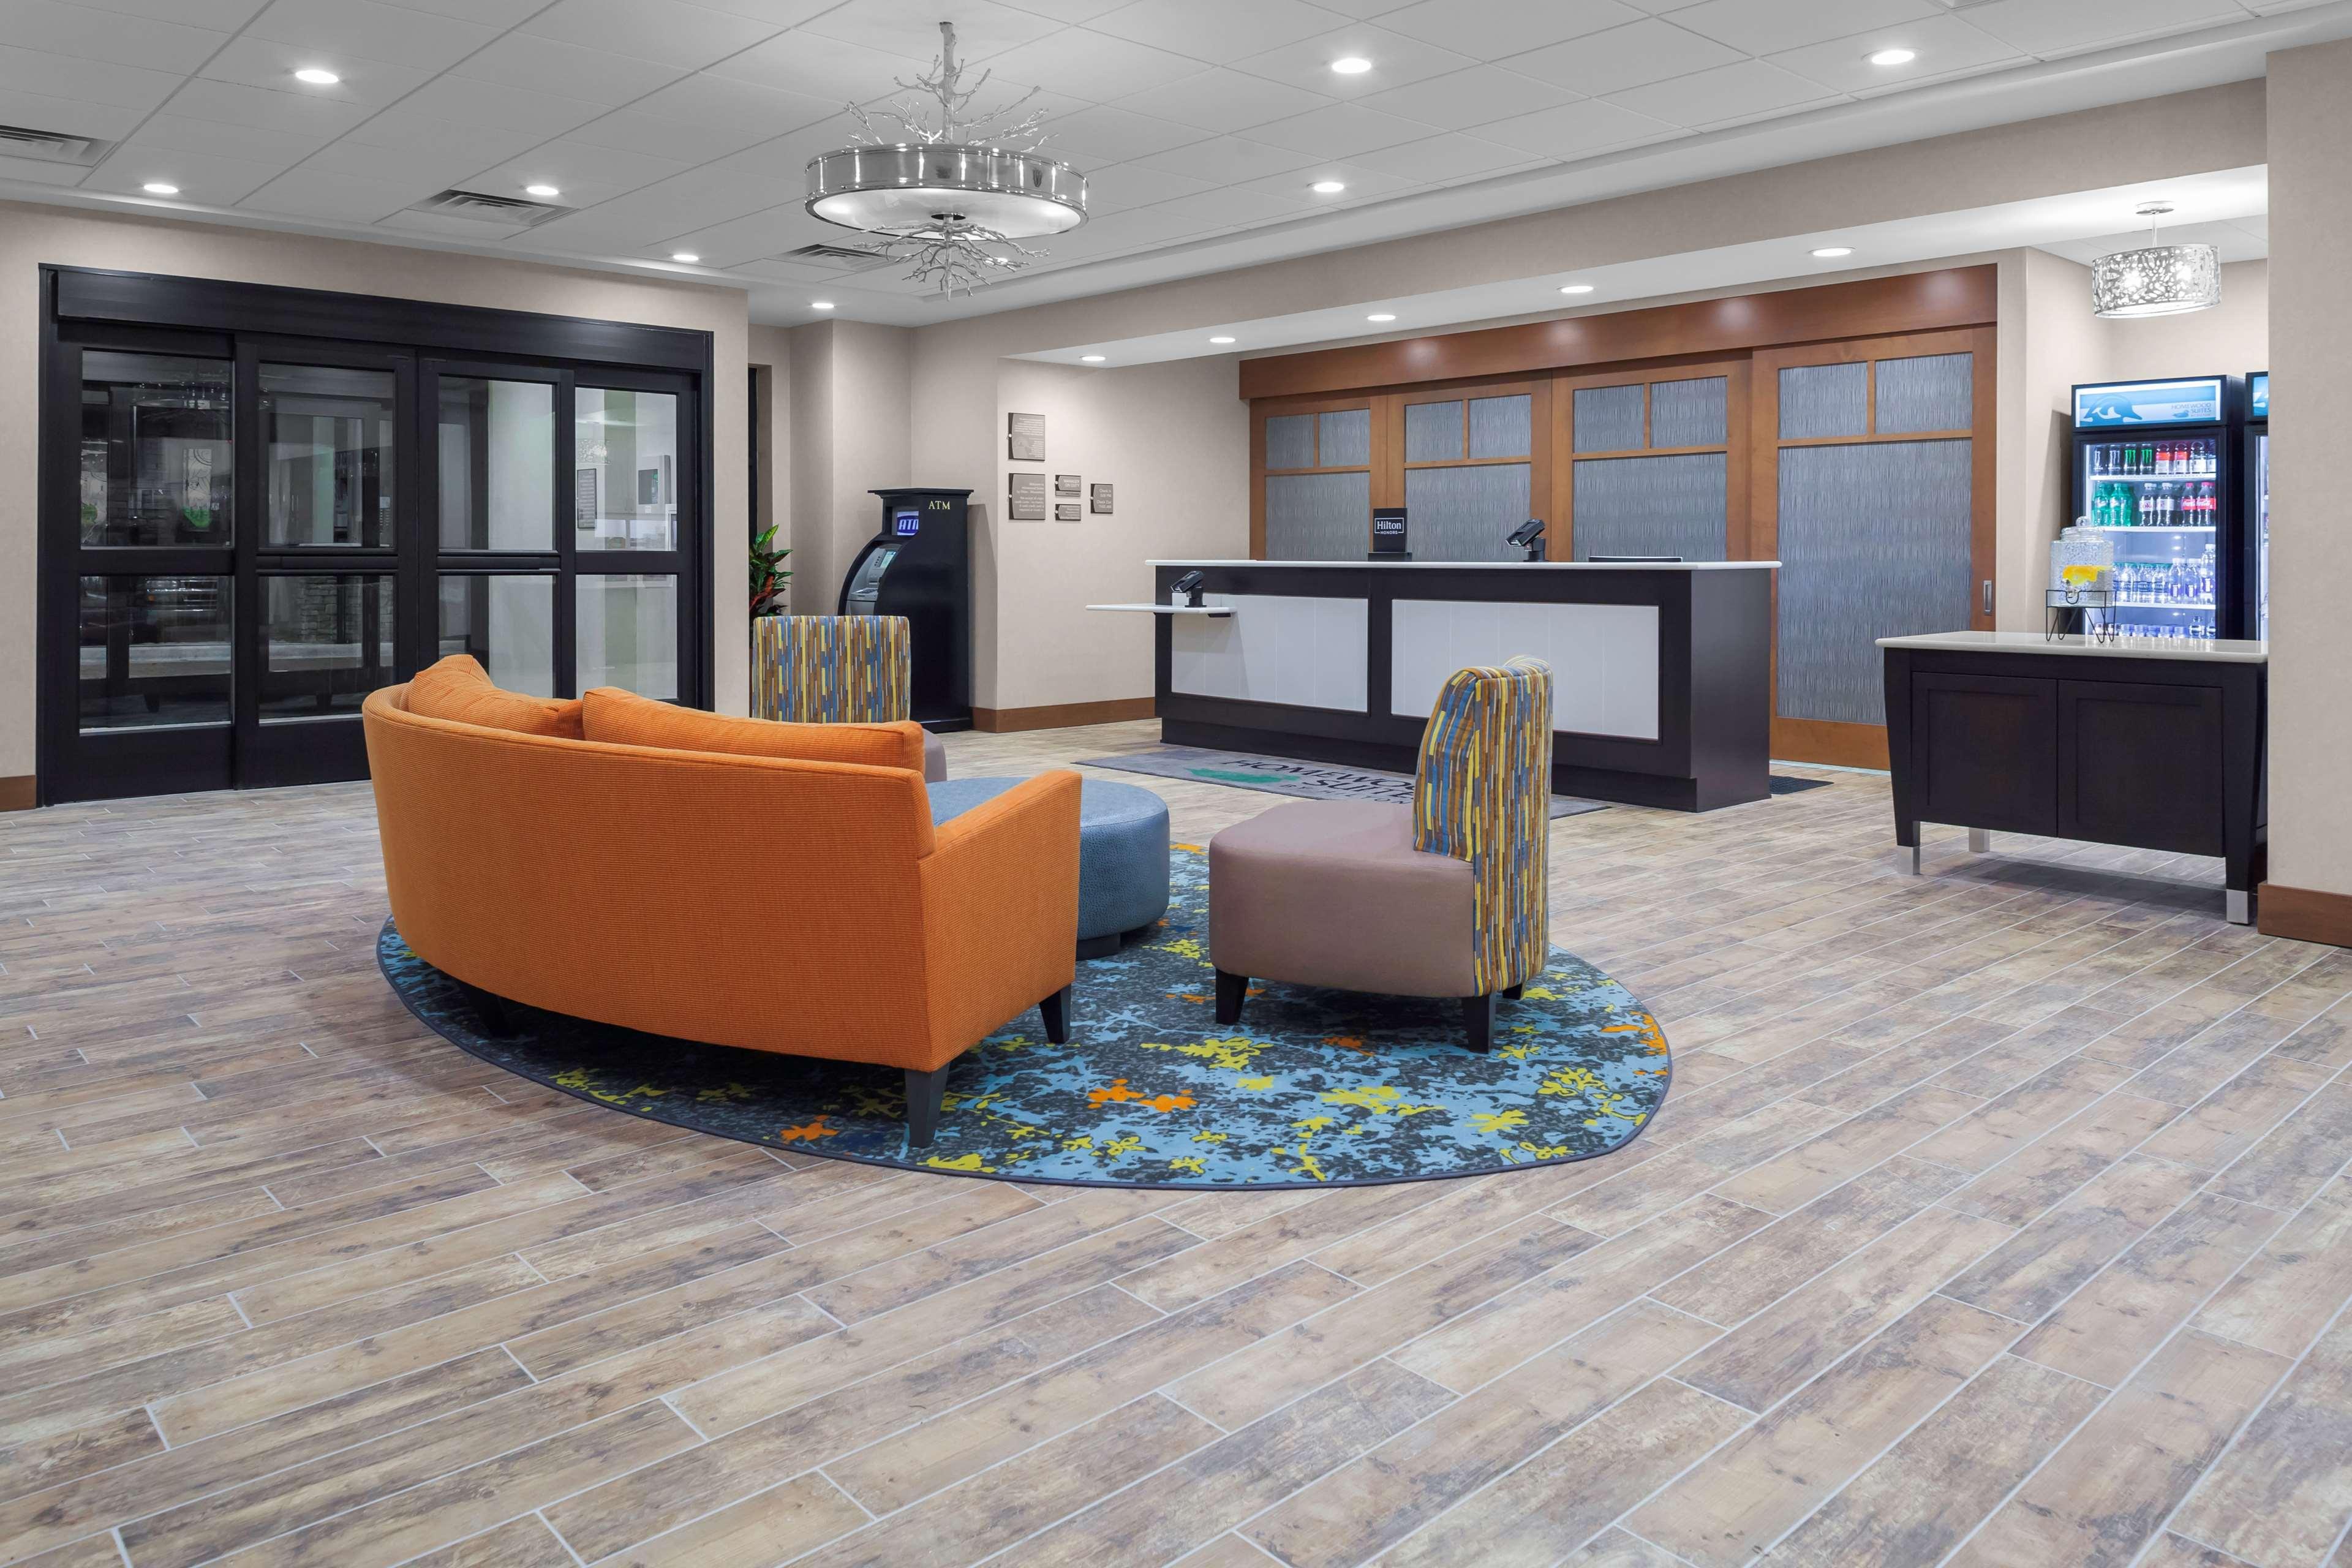 Homewood Suites by Hilton Wauwatosa Milwaukee image 3